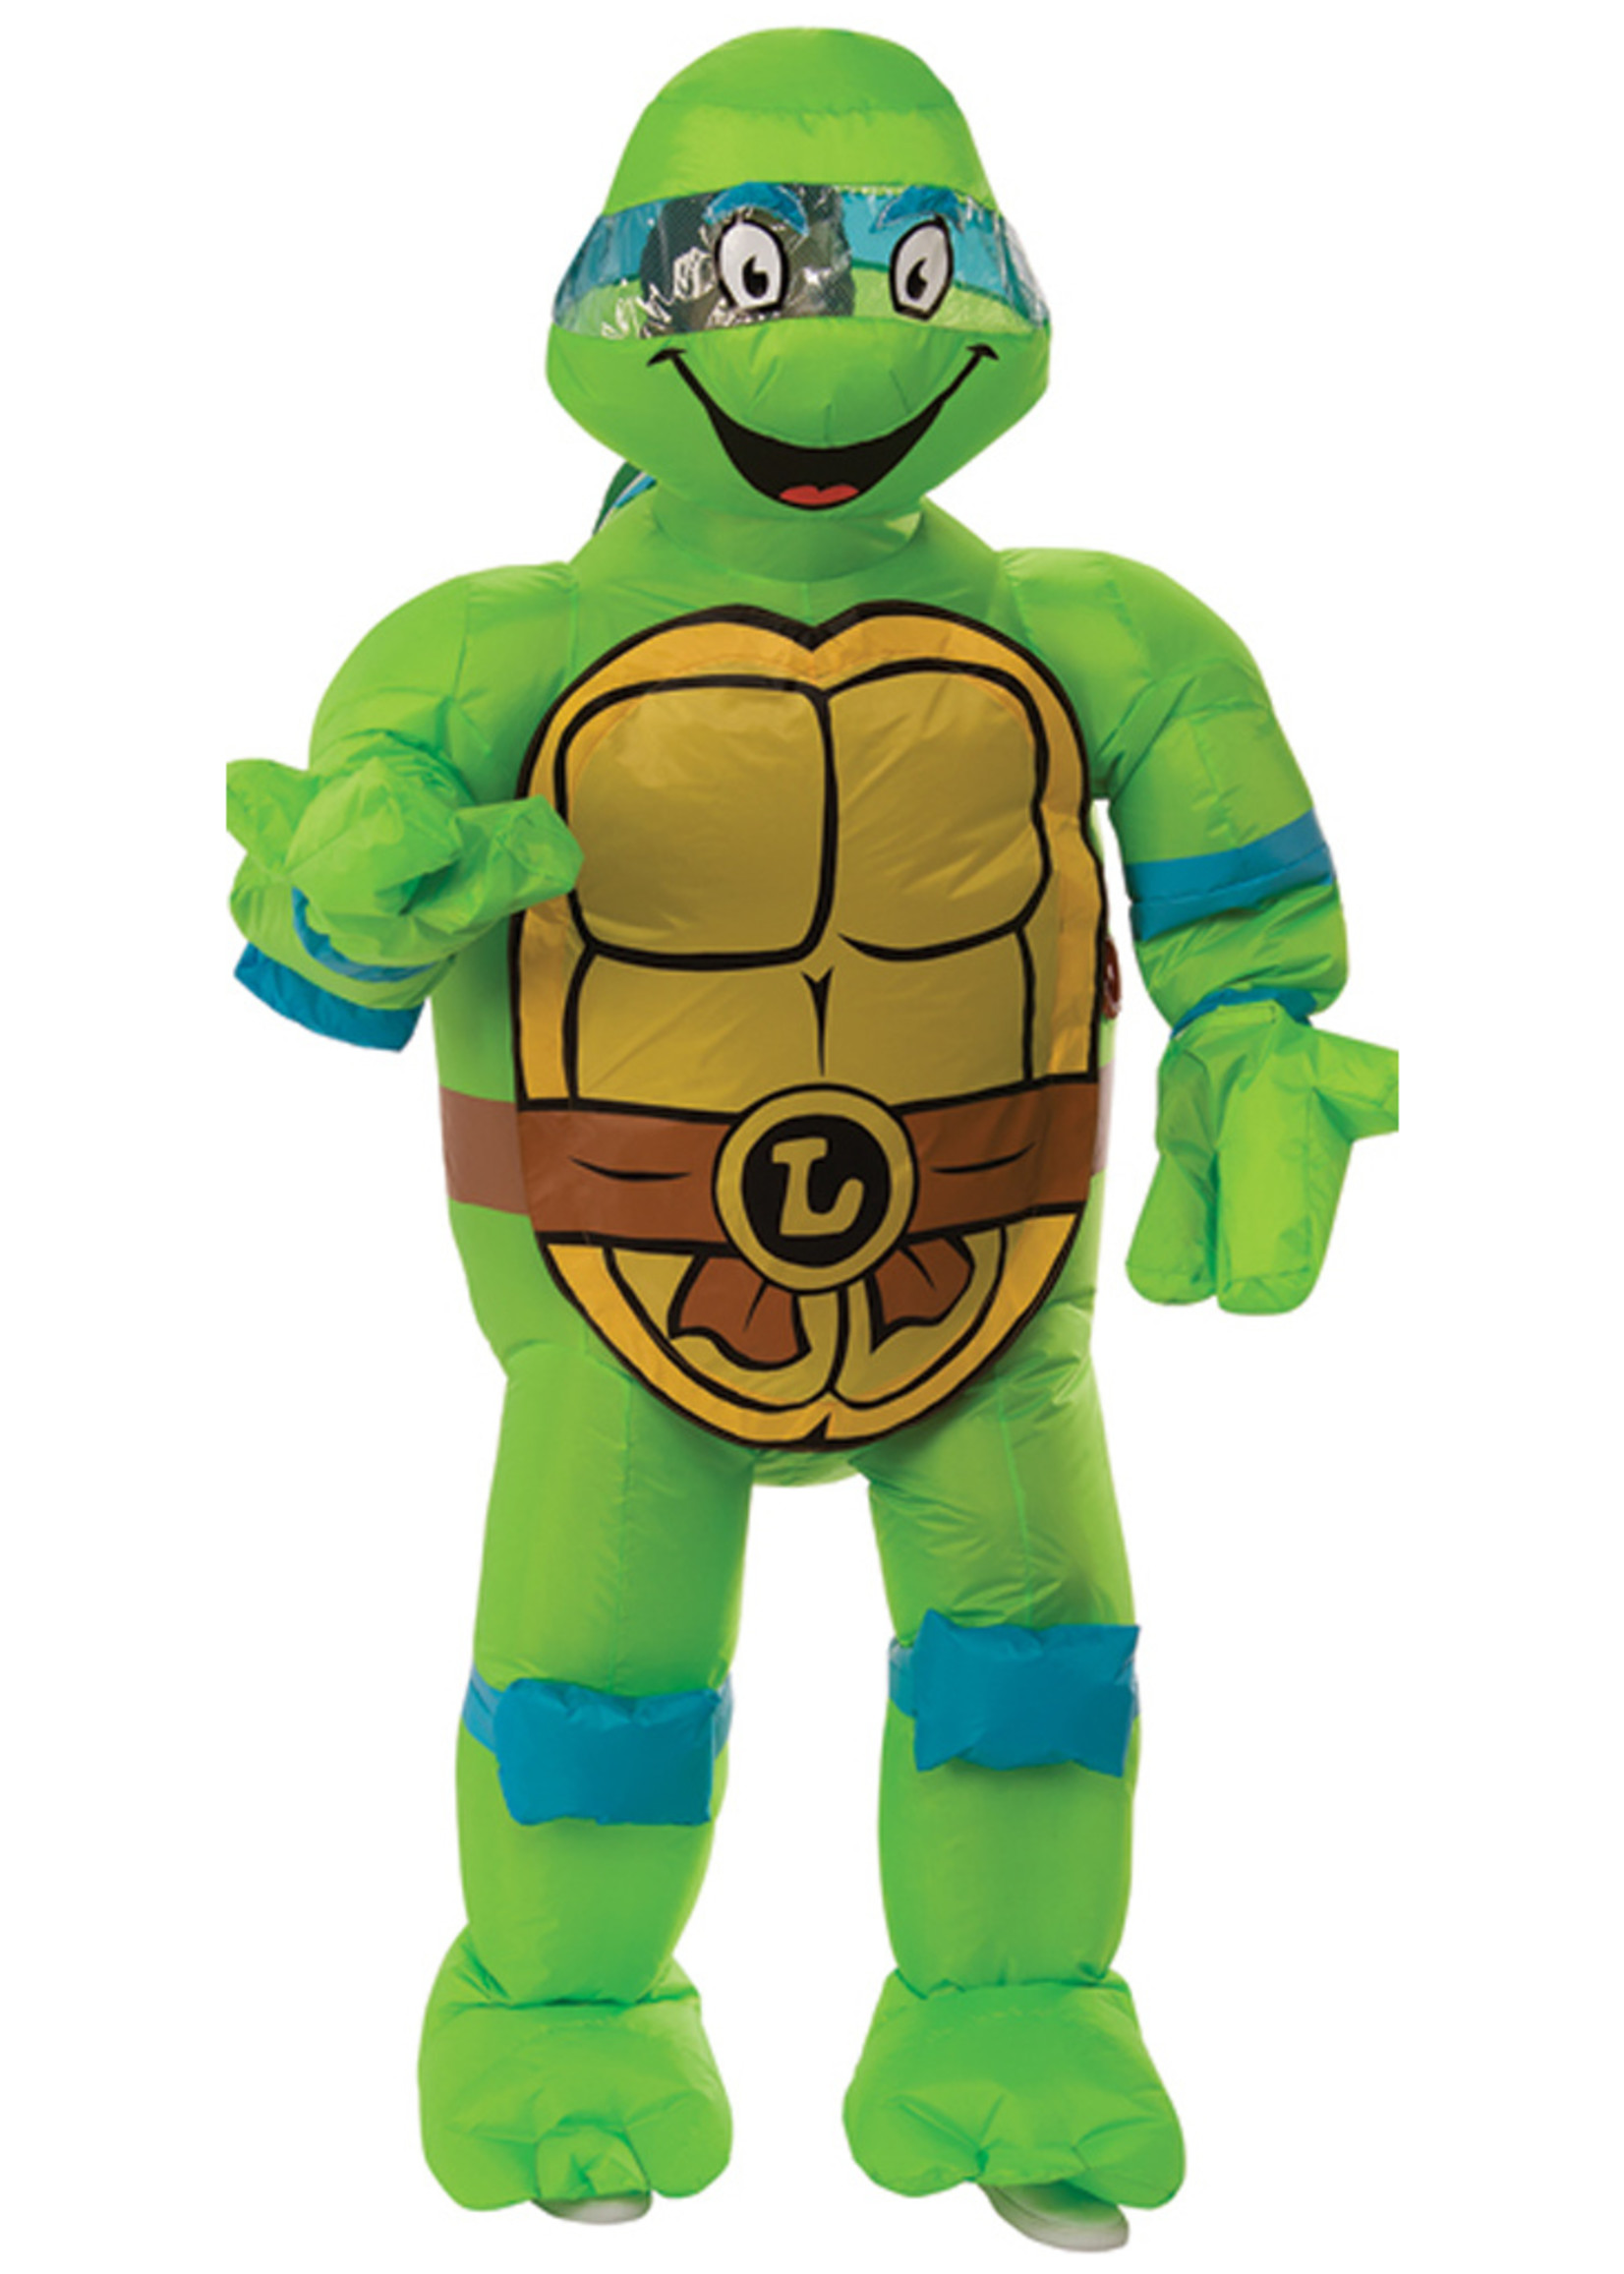 Inflatable Leonardo Costume - Men's